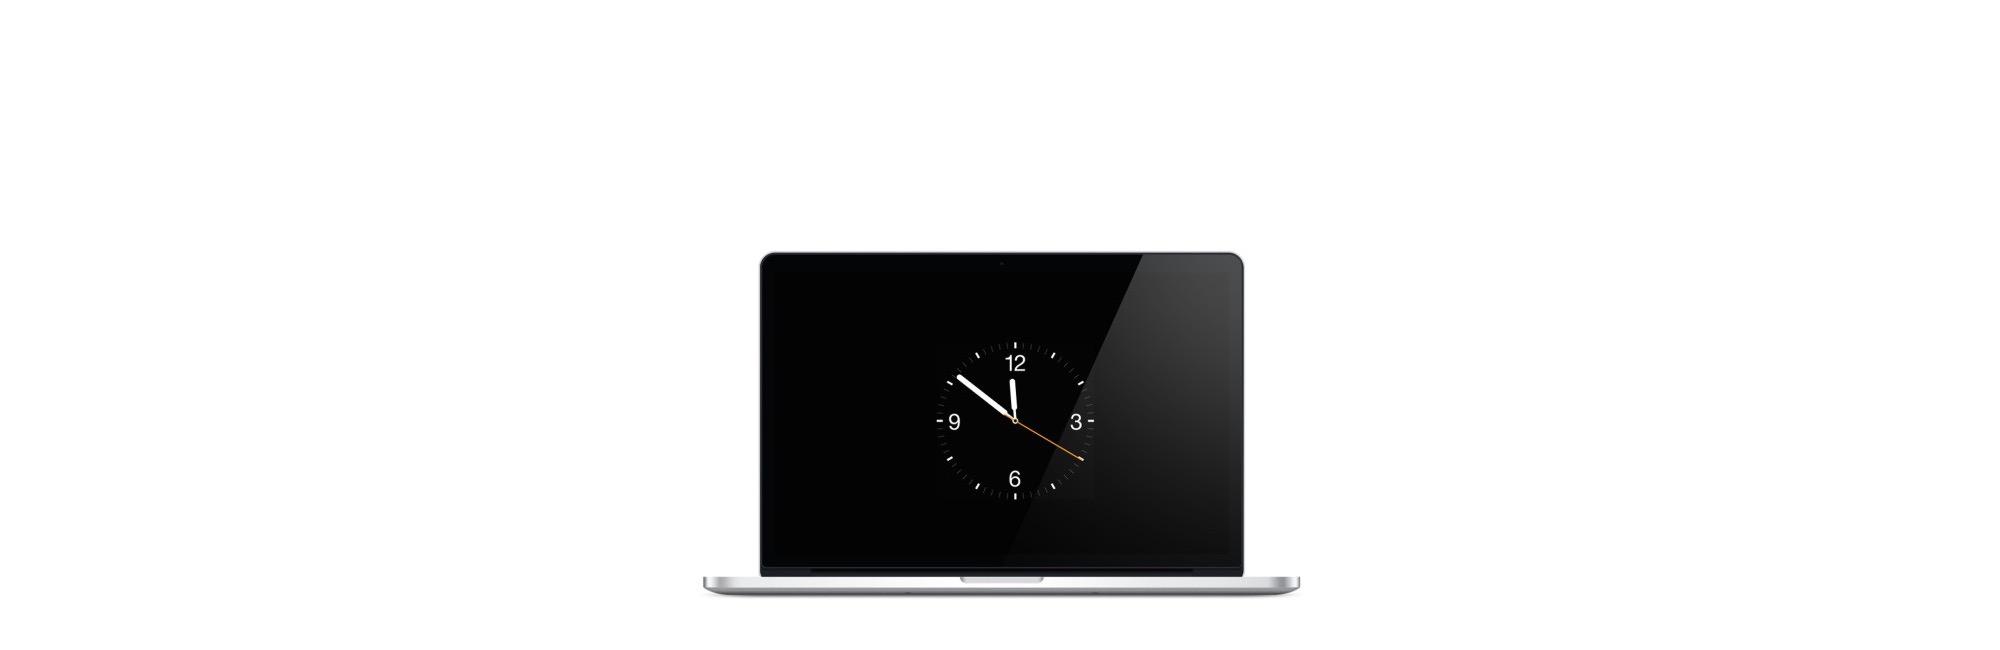 Apple-Watch-OS-X-Screensaver-hero-hero